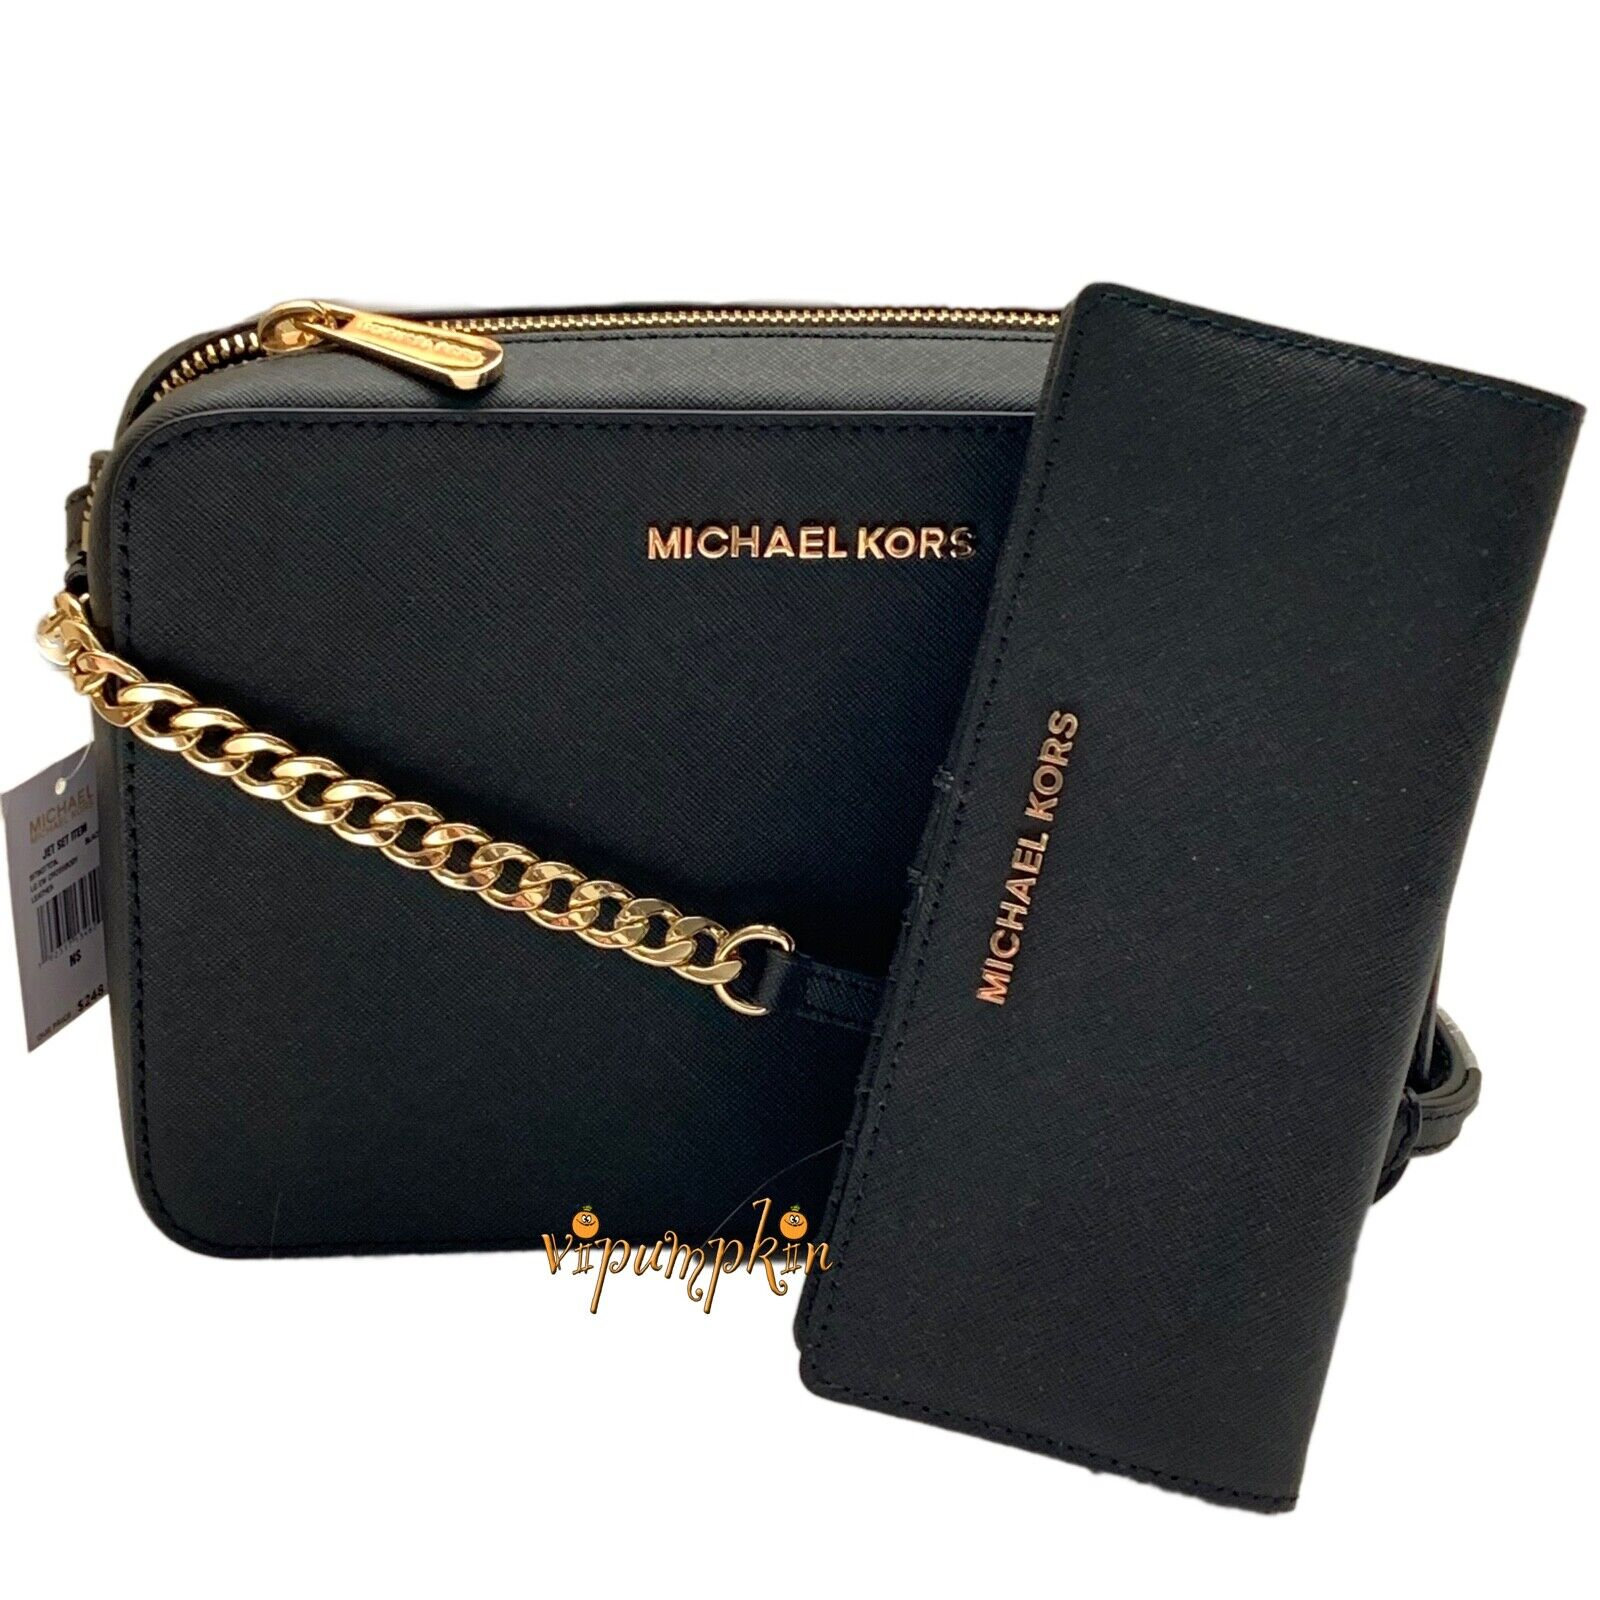 Michael Kors Jet Set Item Crossbody Bag Wallet Set Saffiano